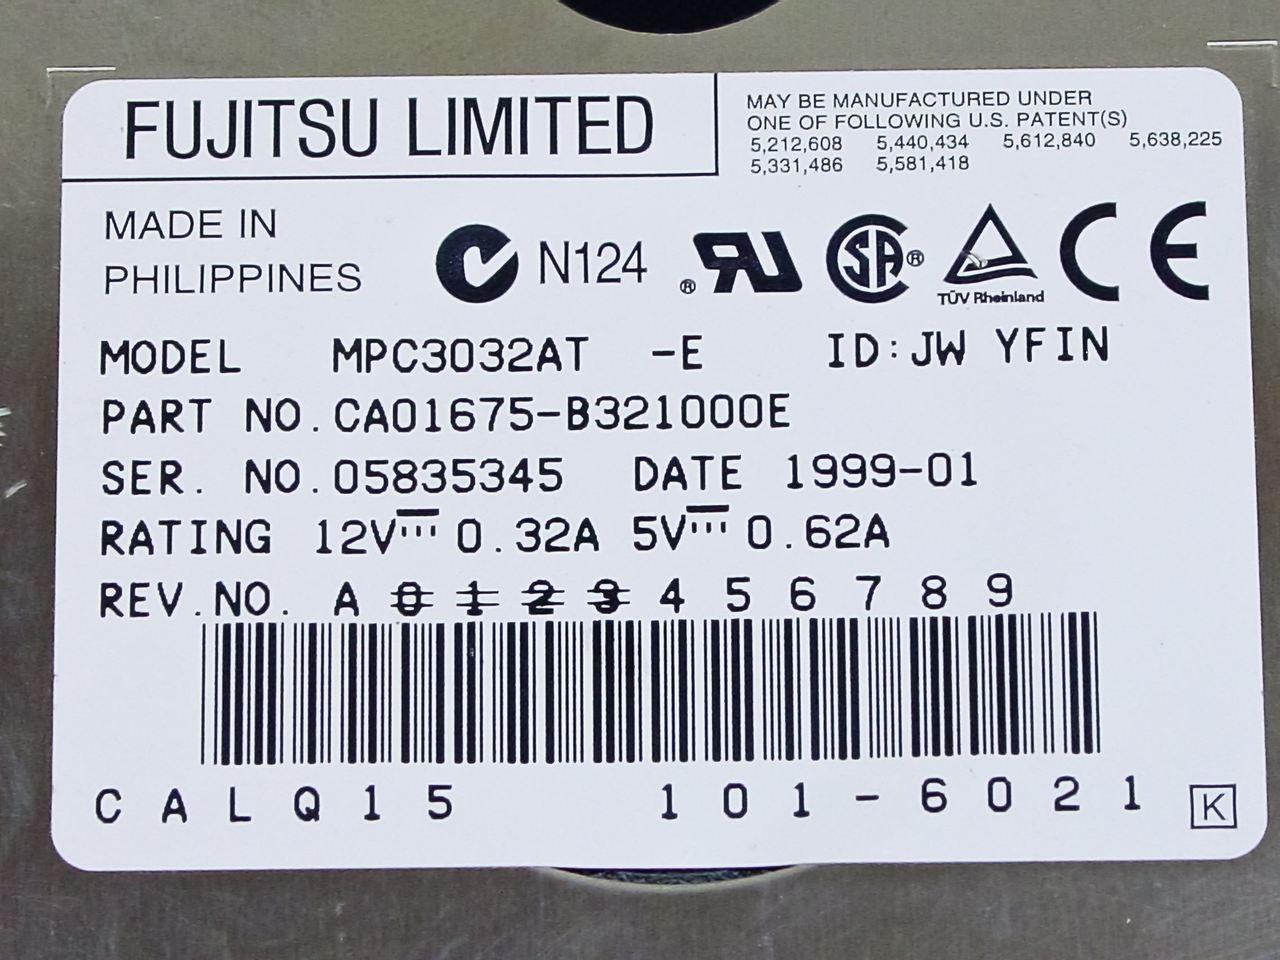 fujitsu mpc3032at 3 2gb 3 5 ide hard drive part no. Black Bedroom Furniture Sets. Home Design Ideas